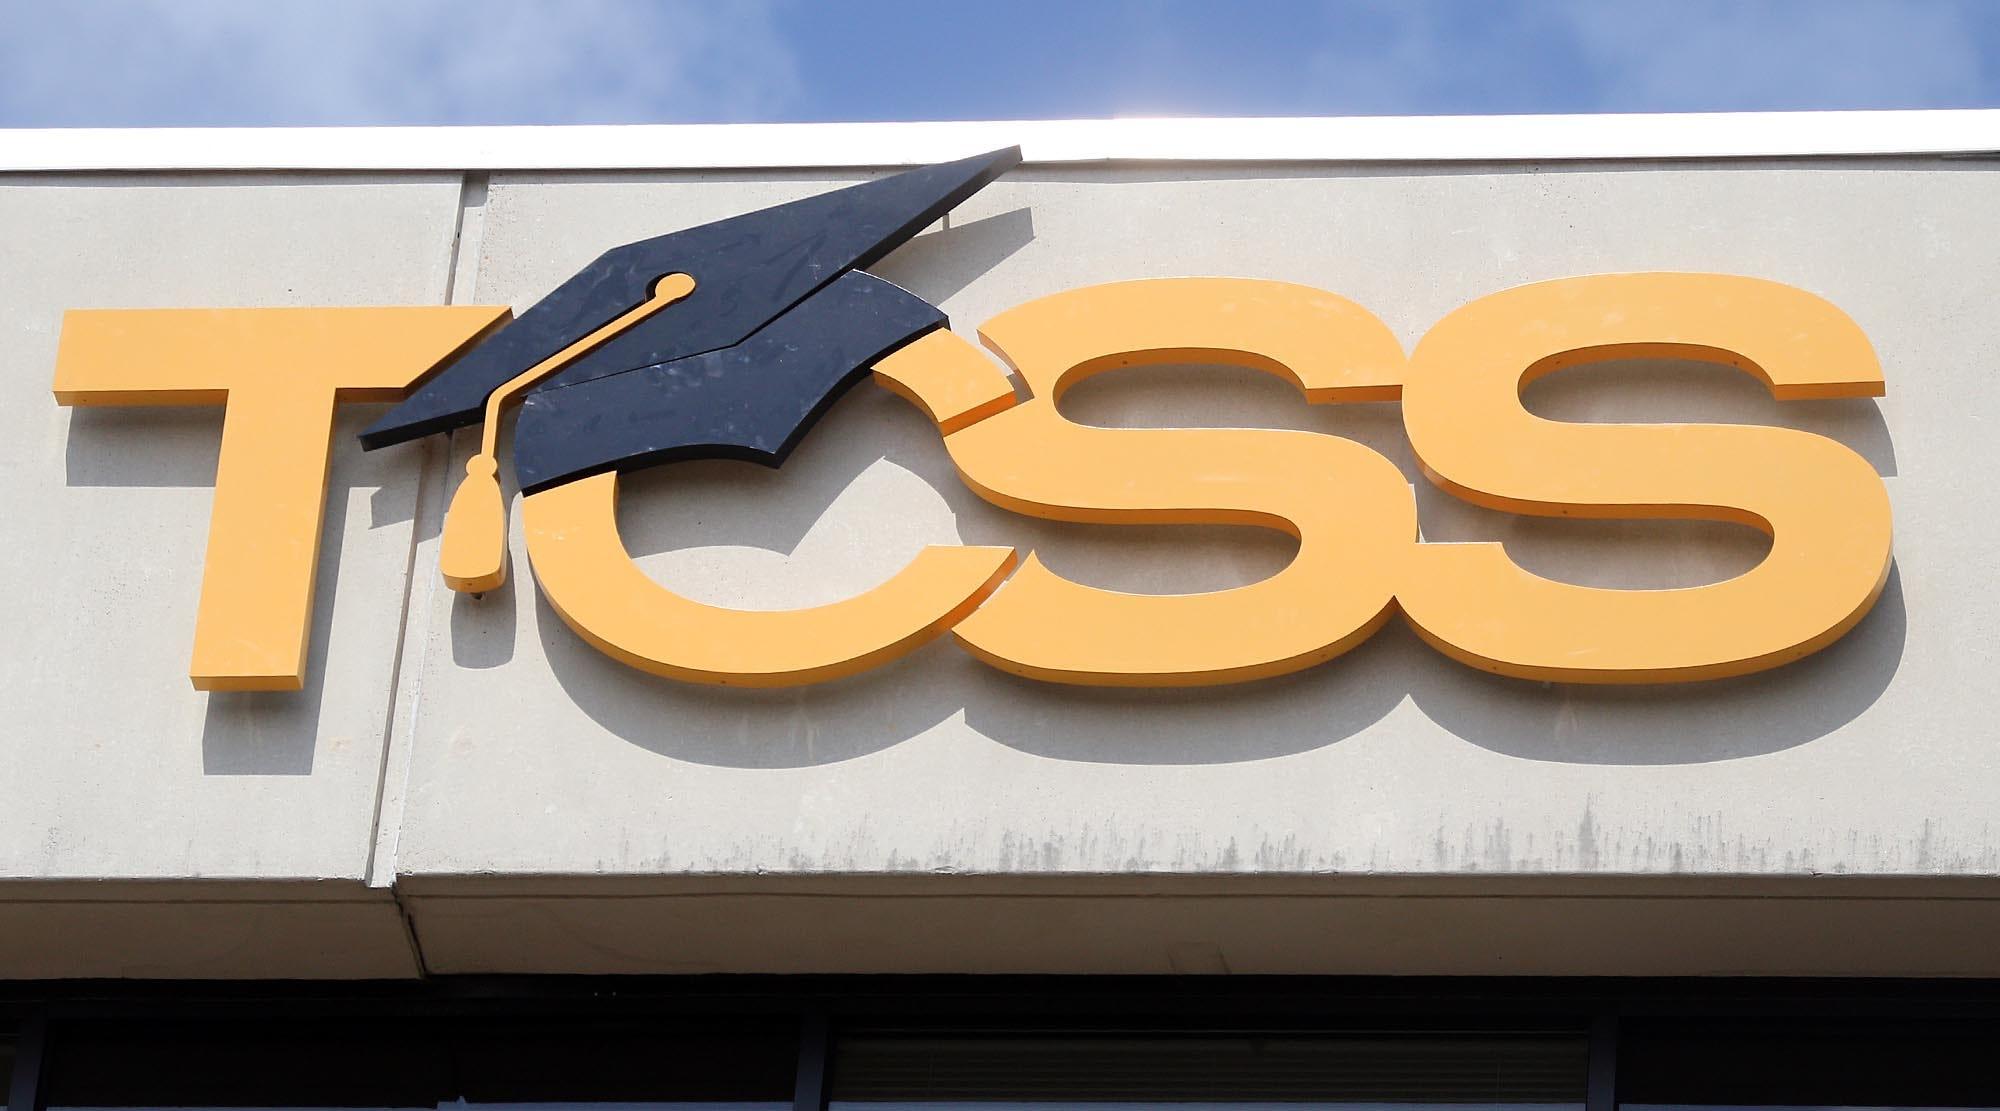 University Of Alabama Academic Calendar 2021-22 Tuscaloosa County seeks feedback on 2021 2022 academic school calendar